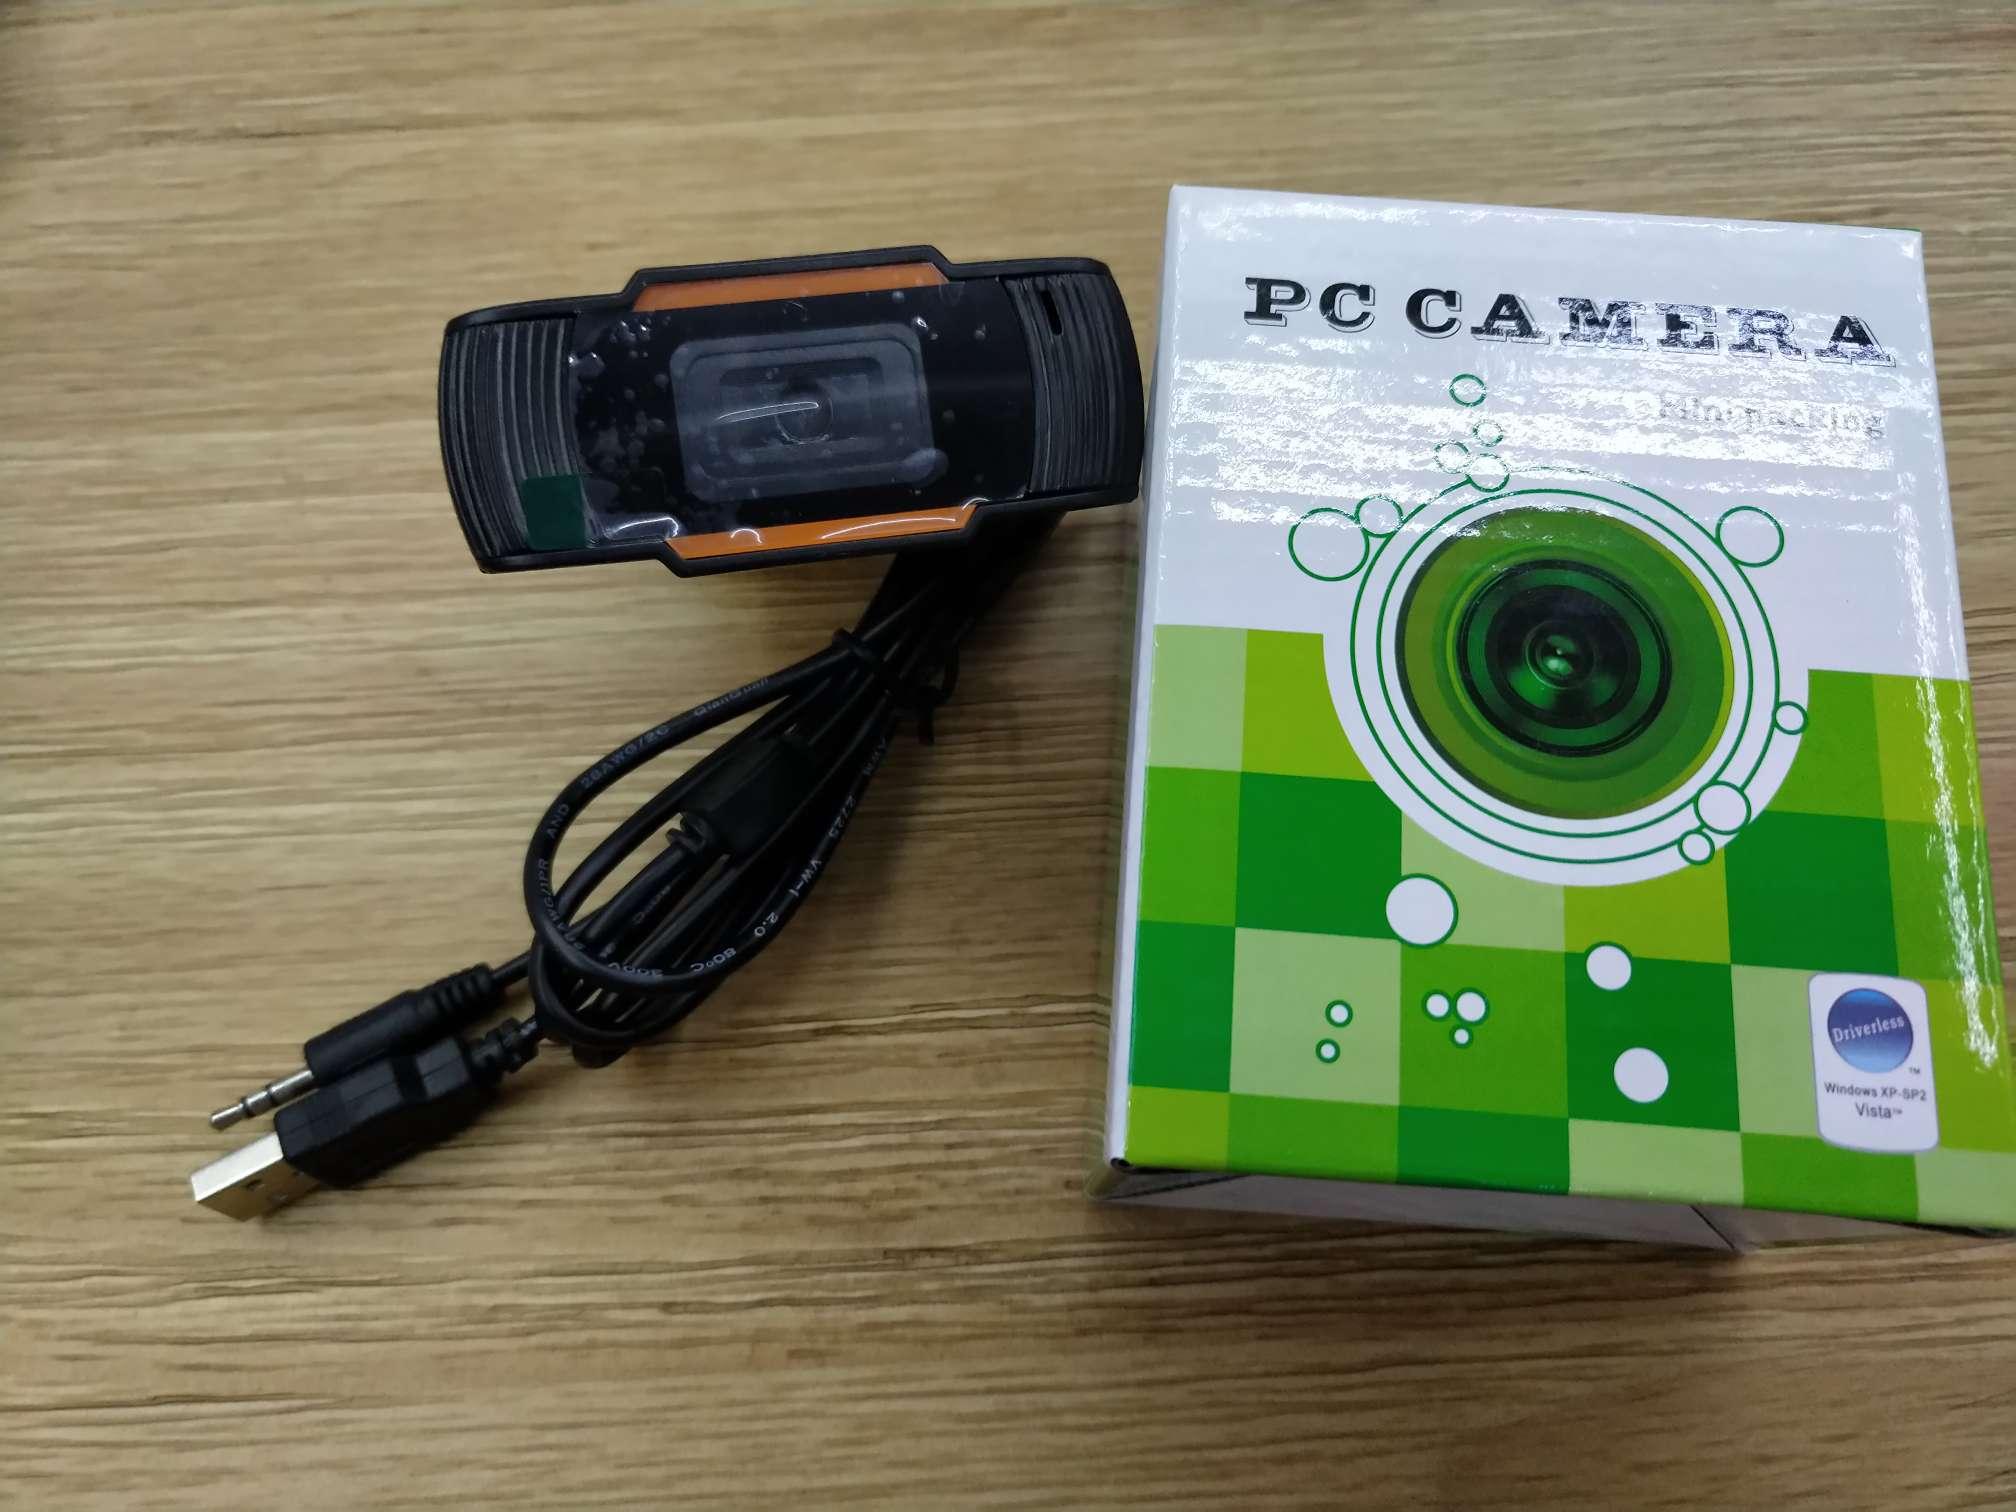 usb摄像头   PC camera